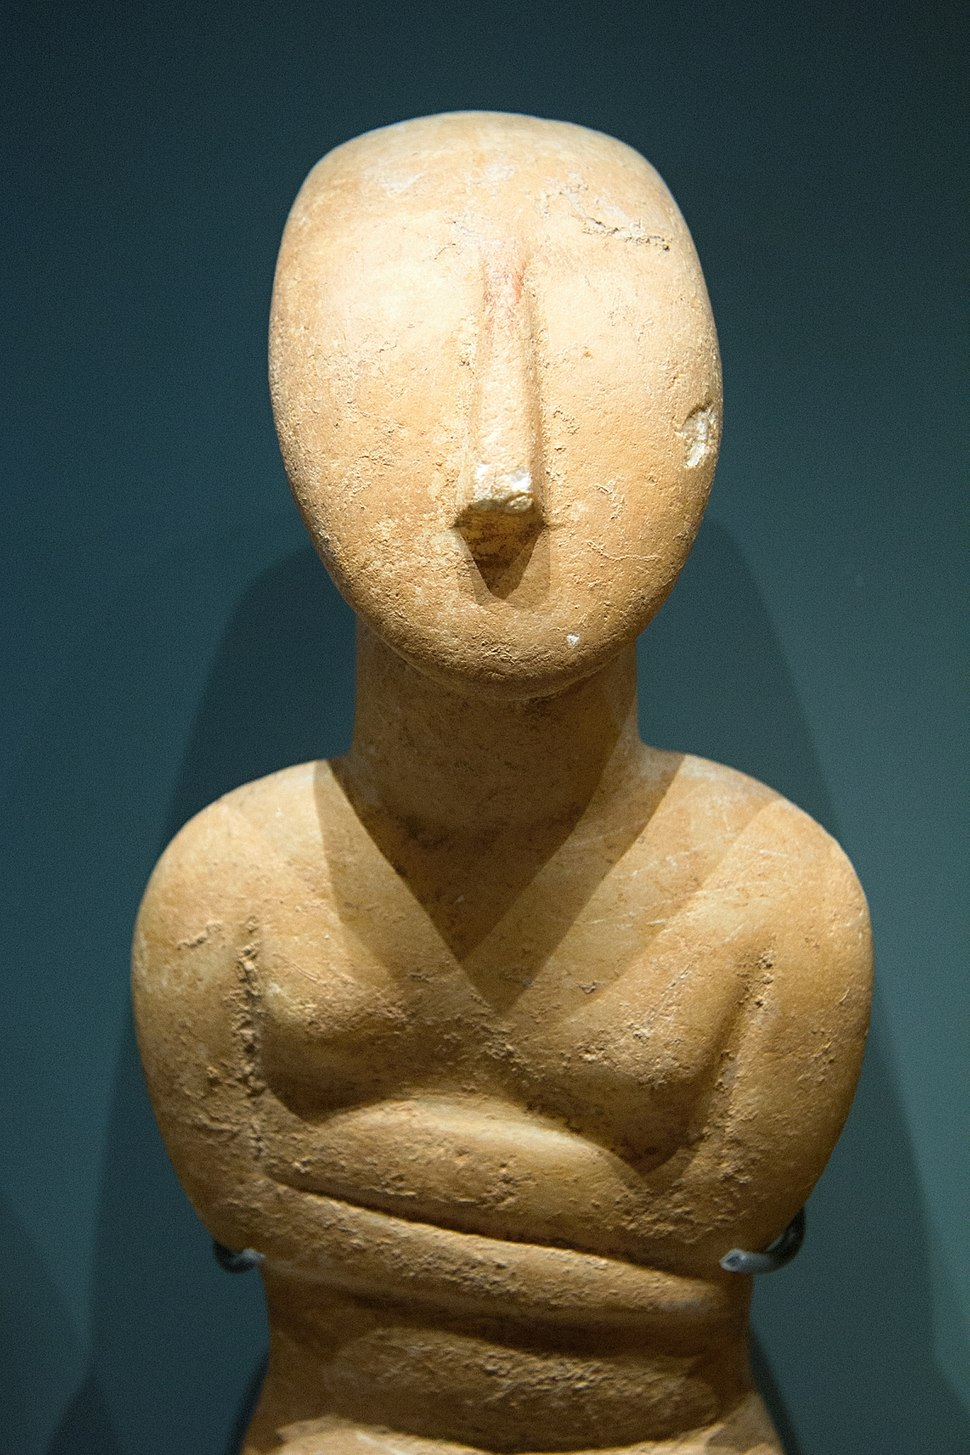 Cycladic figurine female, 2800%E2%80%932300 BC, AshmoleanM, AE 178, 142426